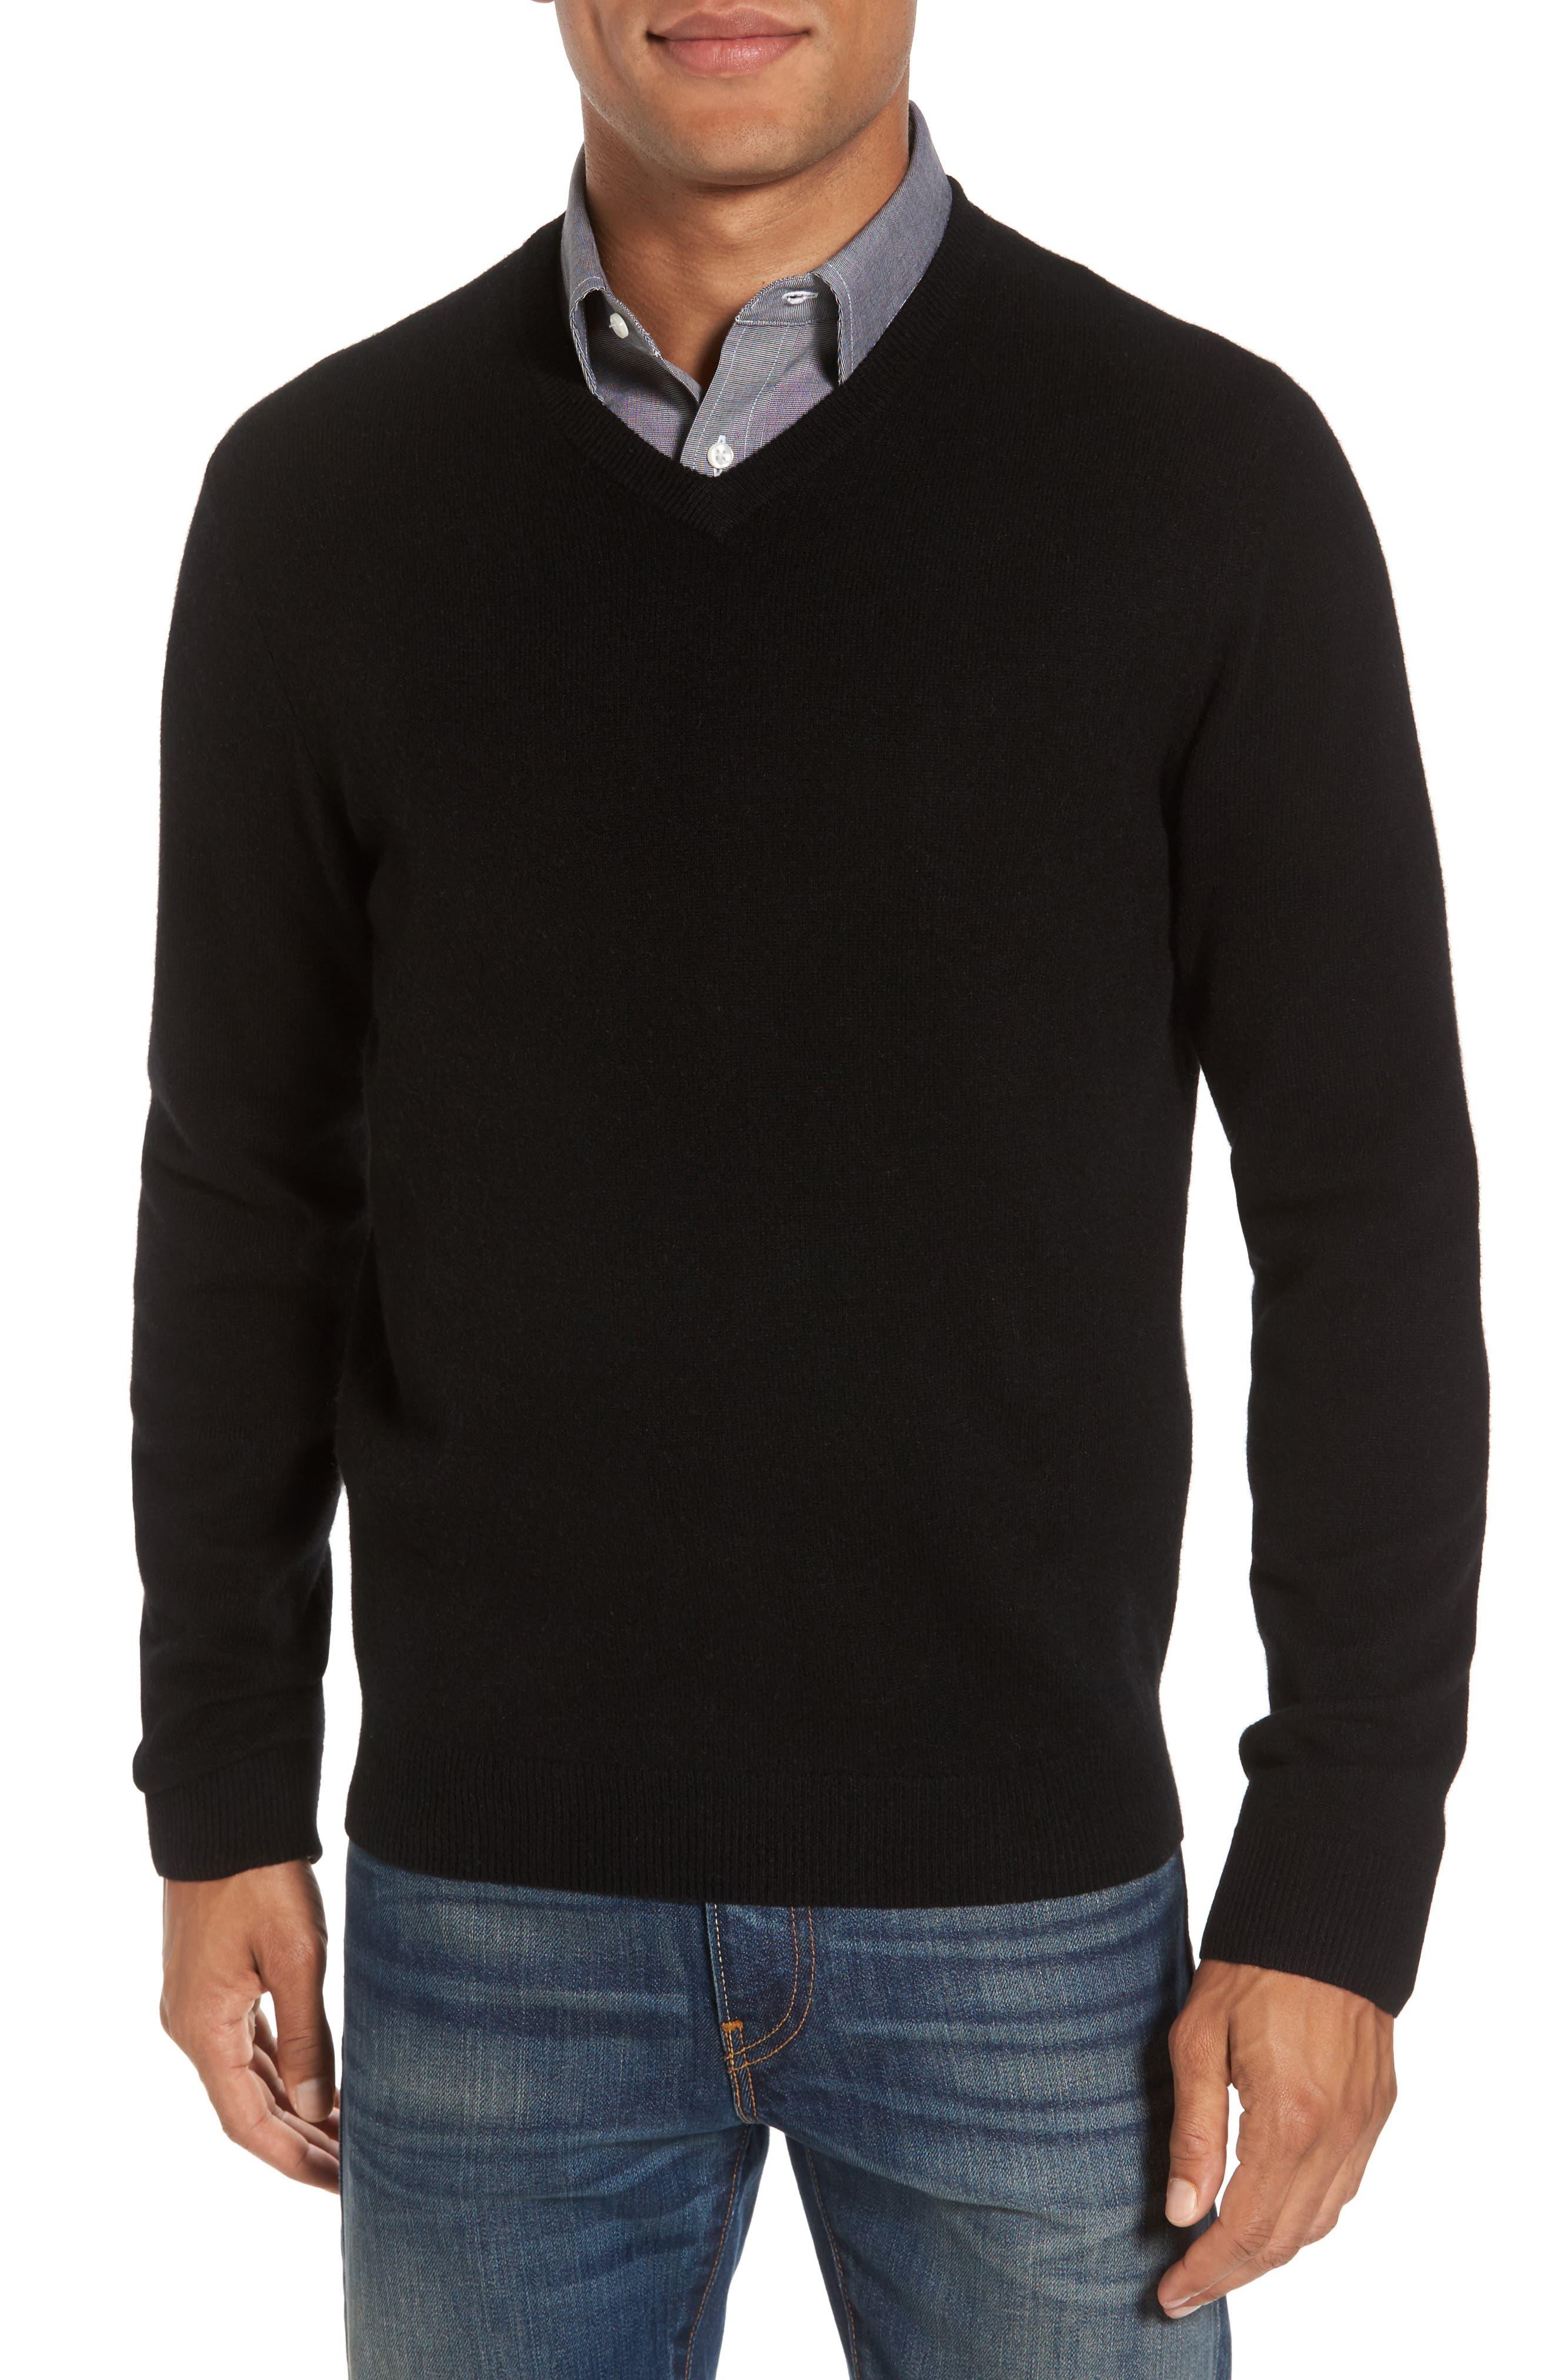 NORDSTROM MEN'S SHOP Cashmere V-Neck Sweater, Main, color, BLACK CAVIAR